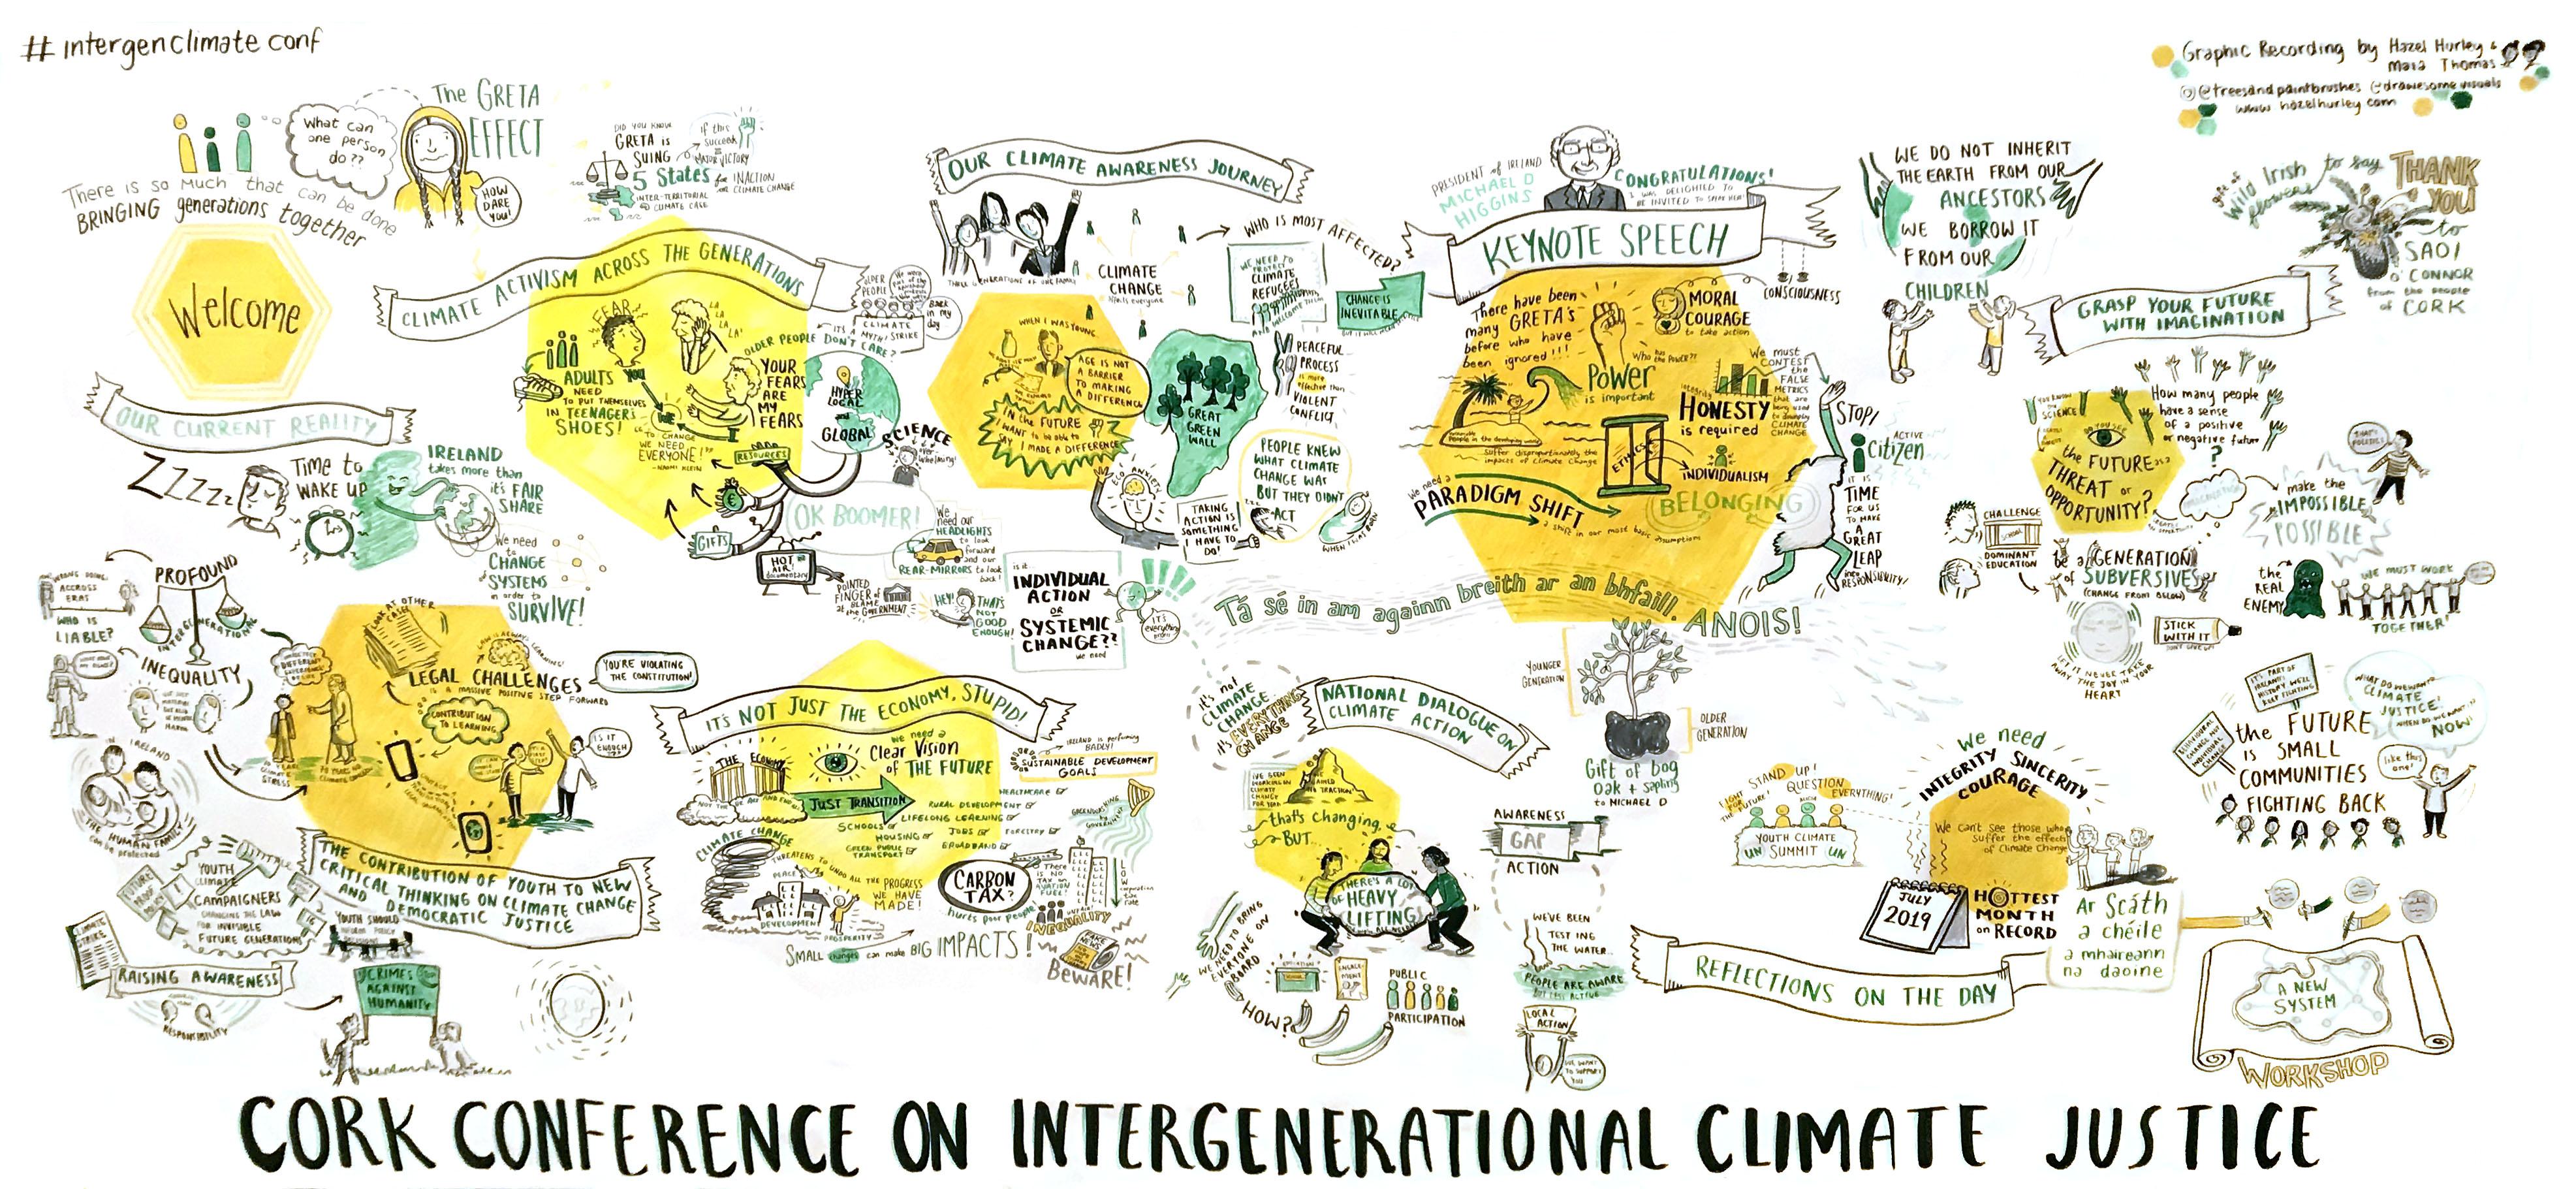 intergen climate conference nov 19